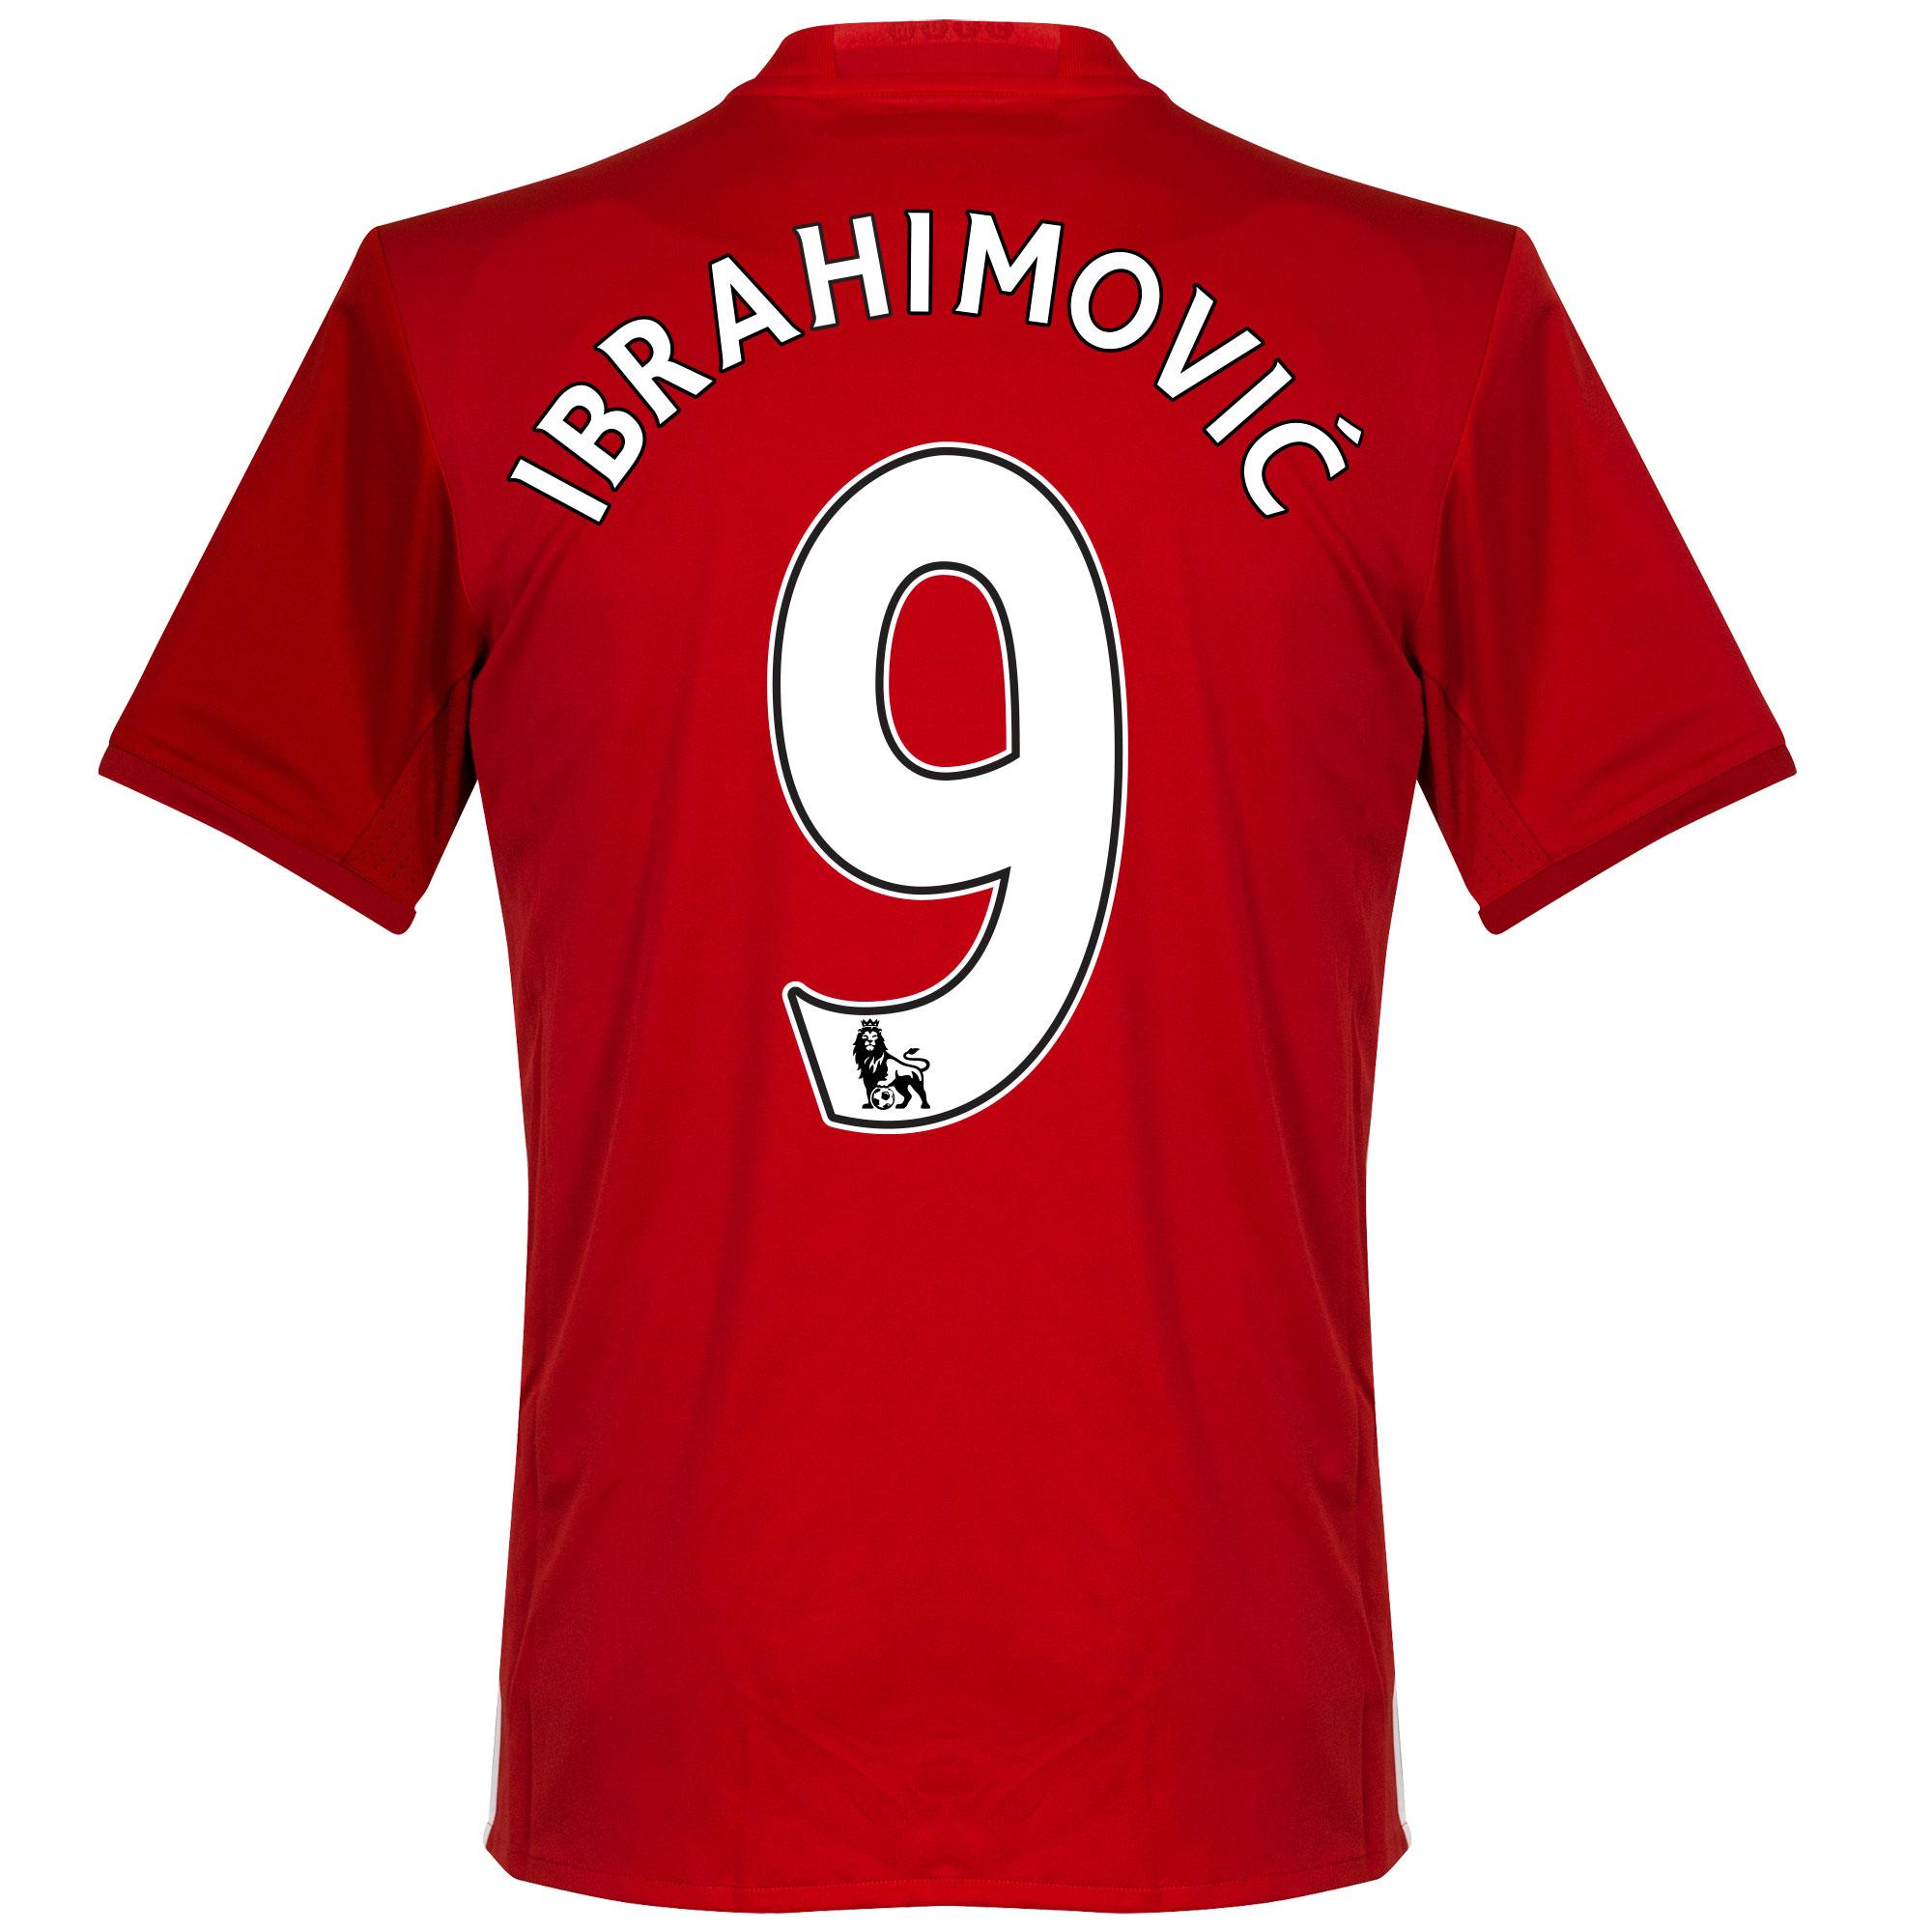 Manchester United Shirt Thuis 2016-2017 + Ibrahimovic 9